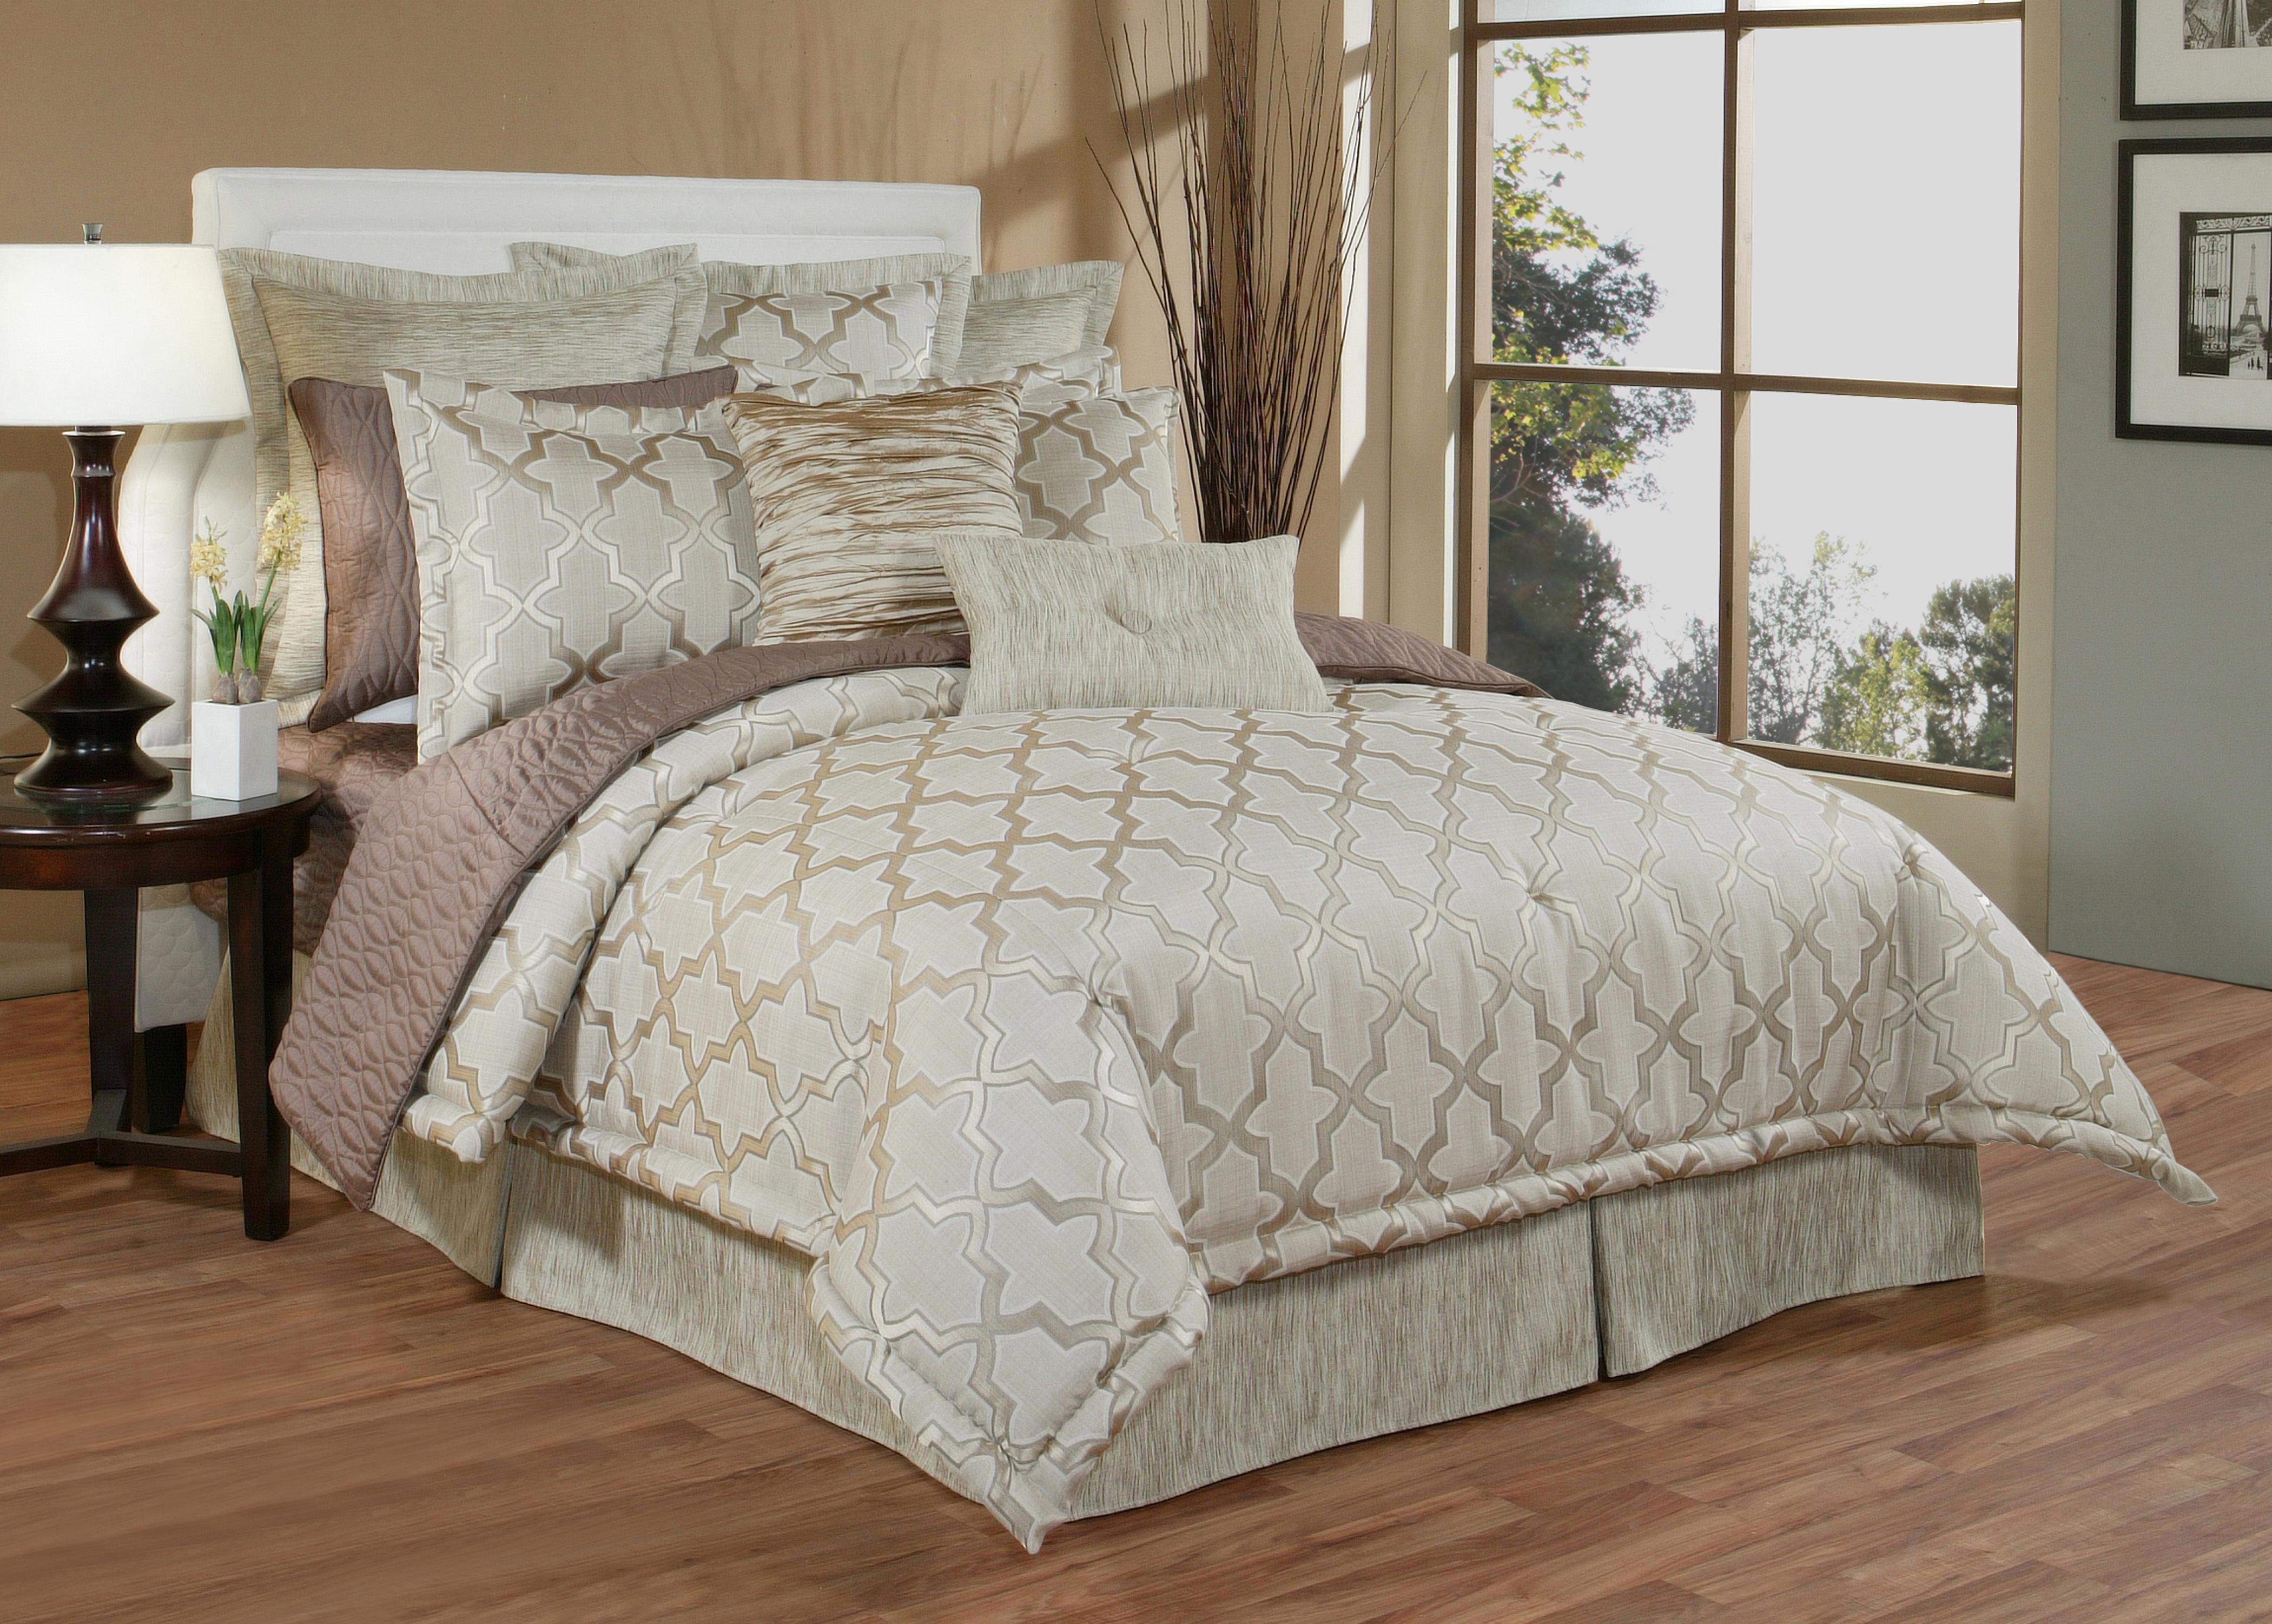 En Vogue Glamour Quartz By Austin Horn Luxury Bedding